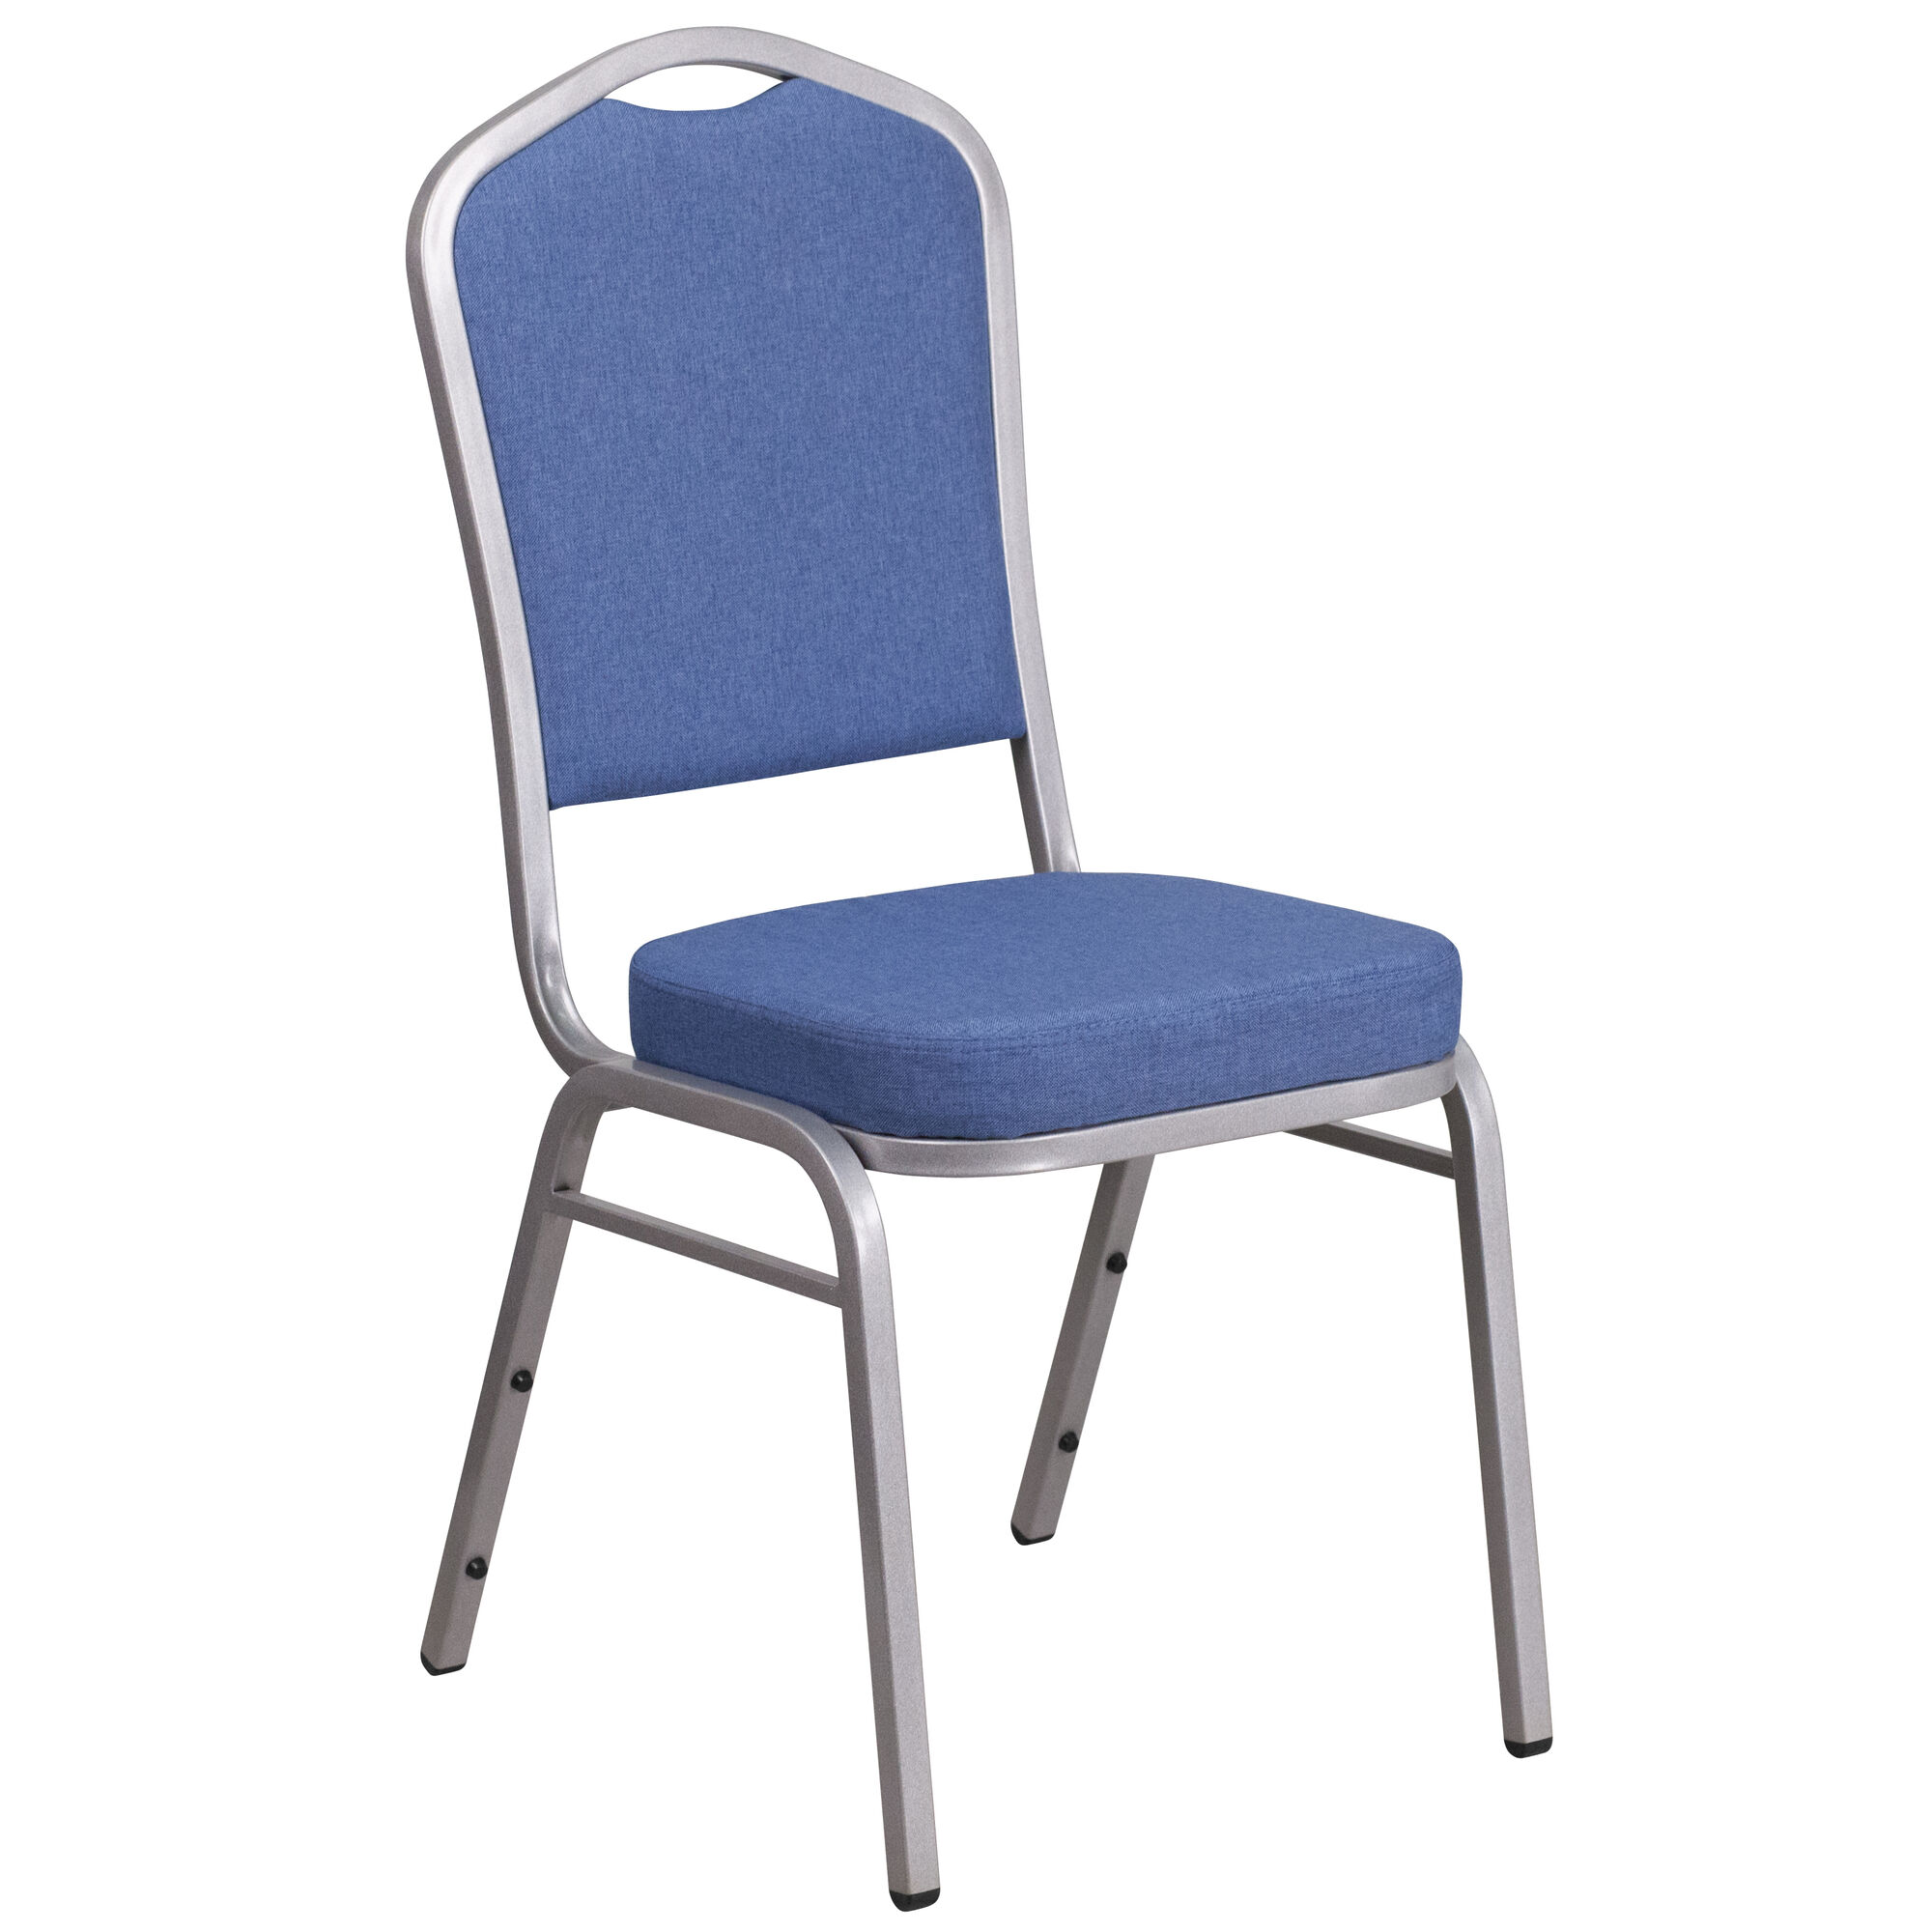 Blue Fabric Banquet Chair Fd C01 S 7 Gg